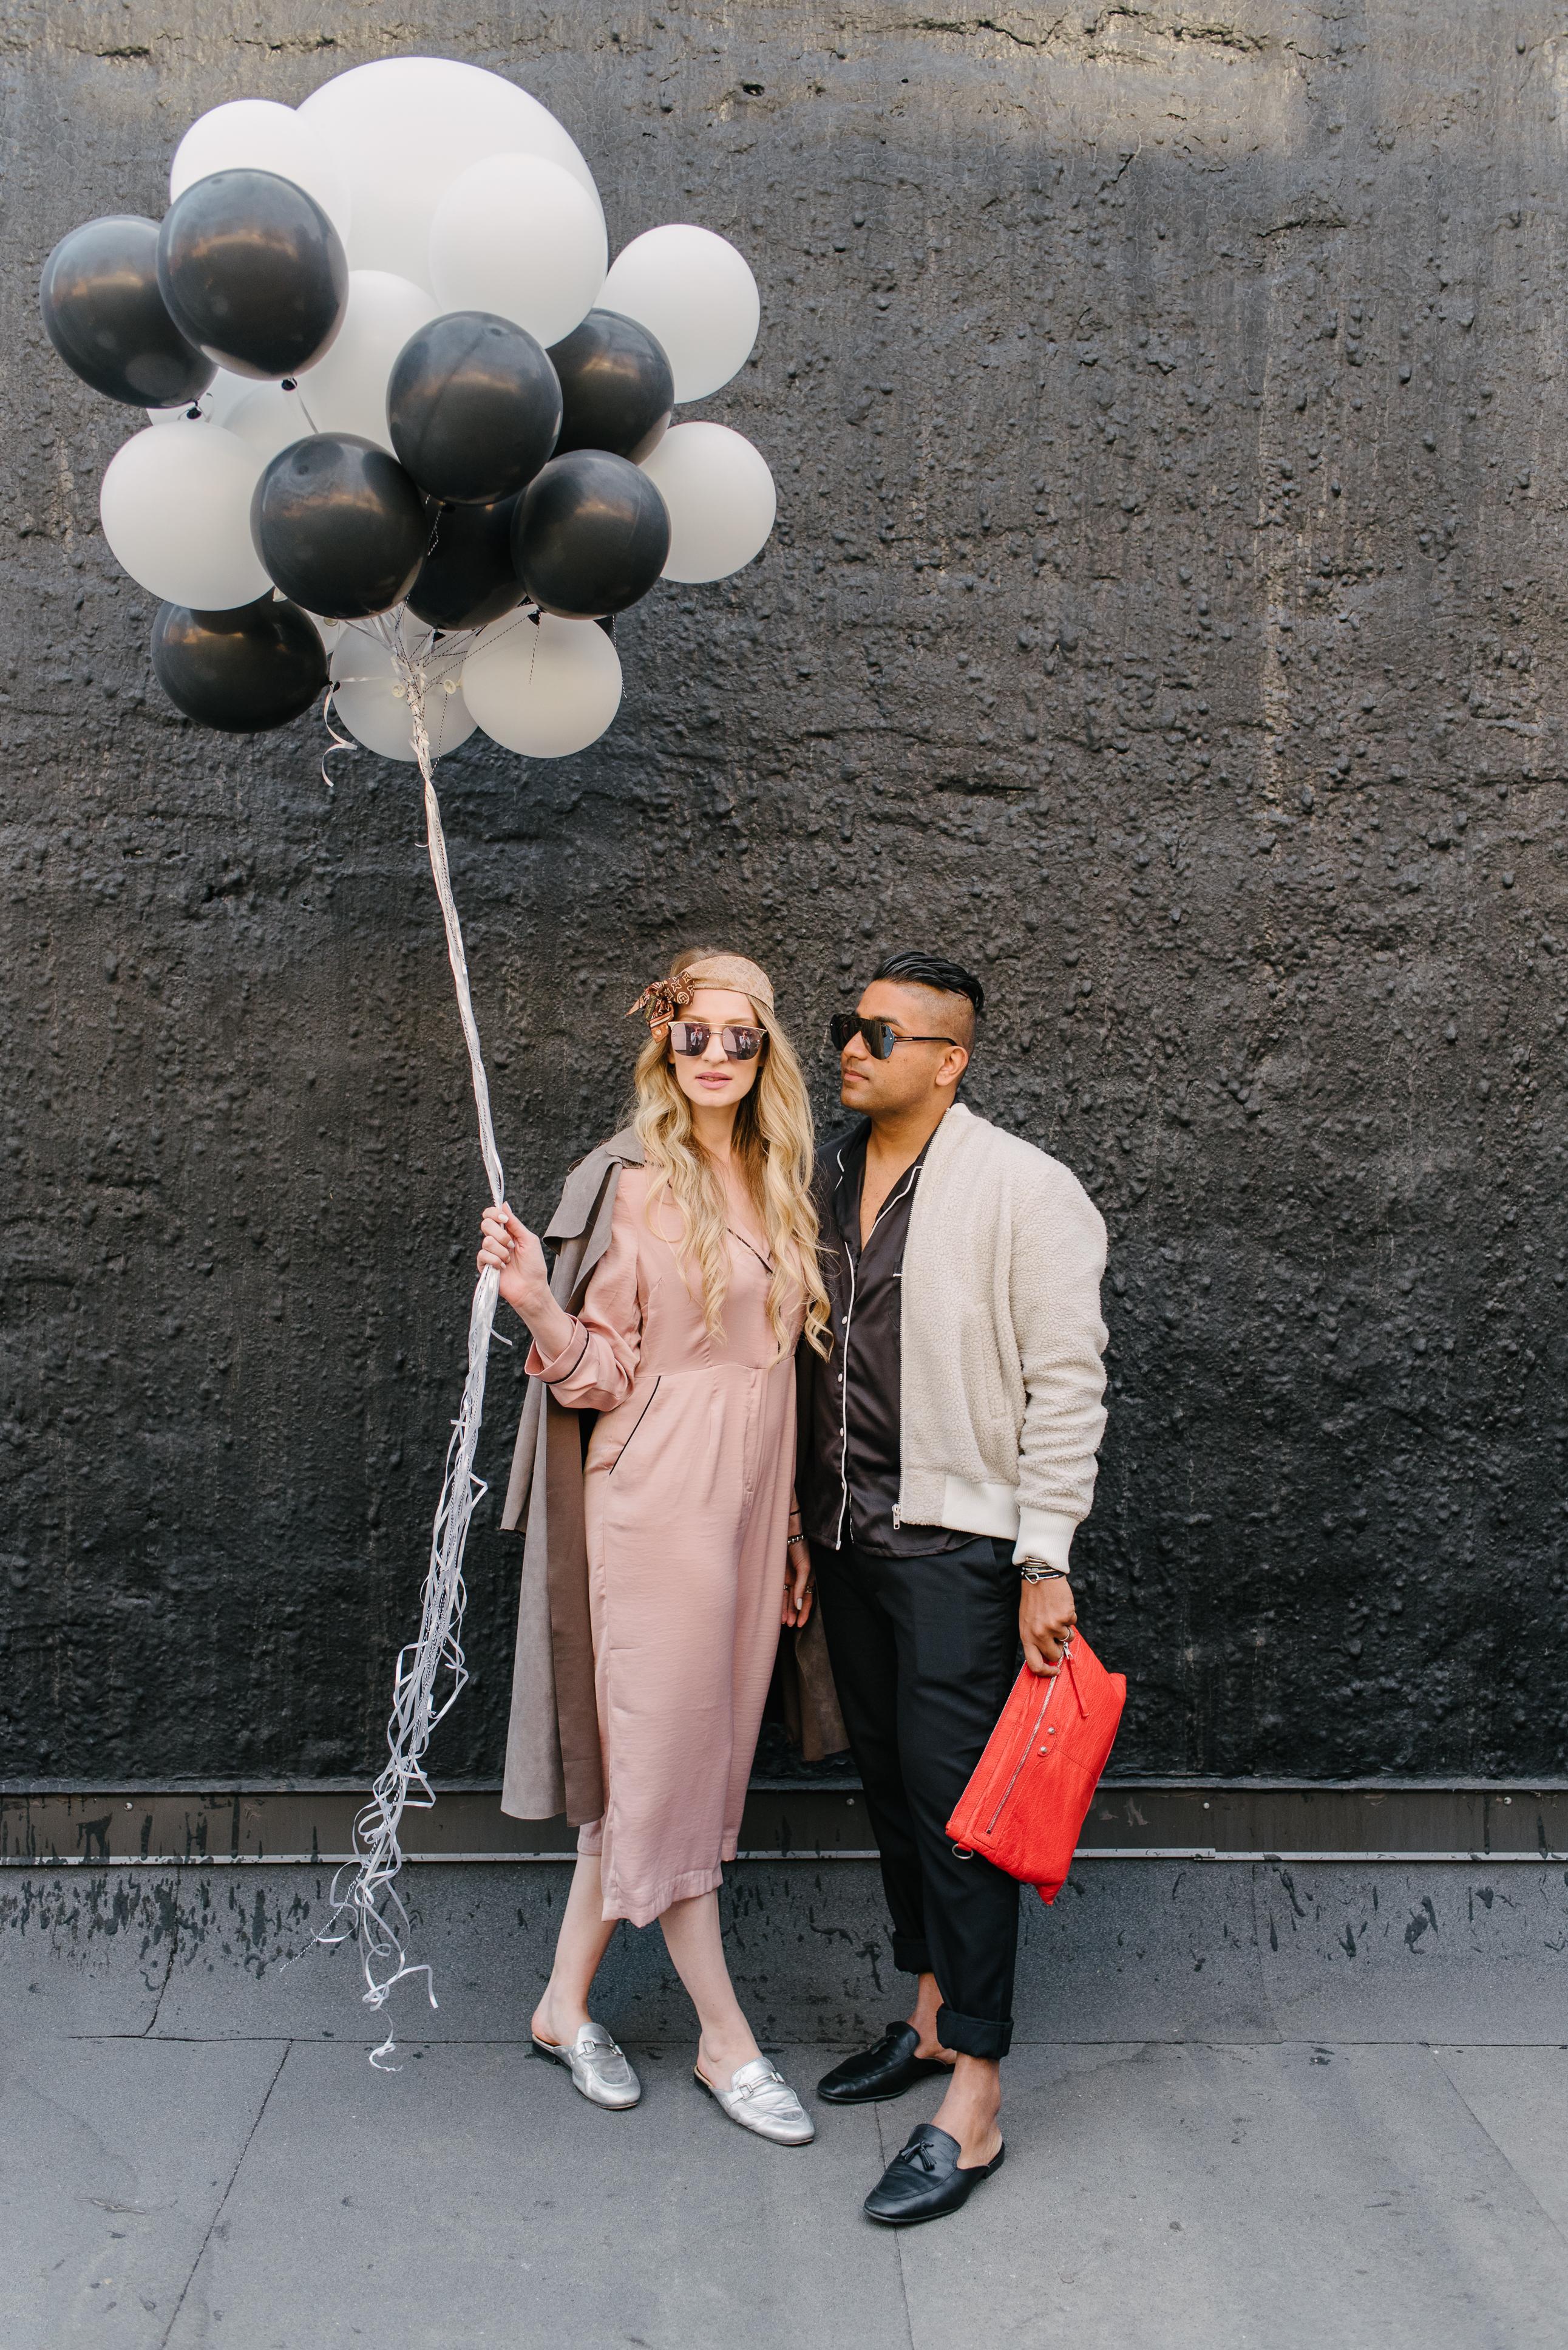 MonMode   Toronto Fashion Blogger   Toronto Blogger   life partner, work partner